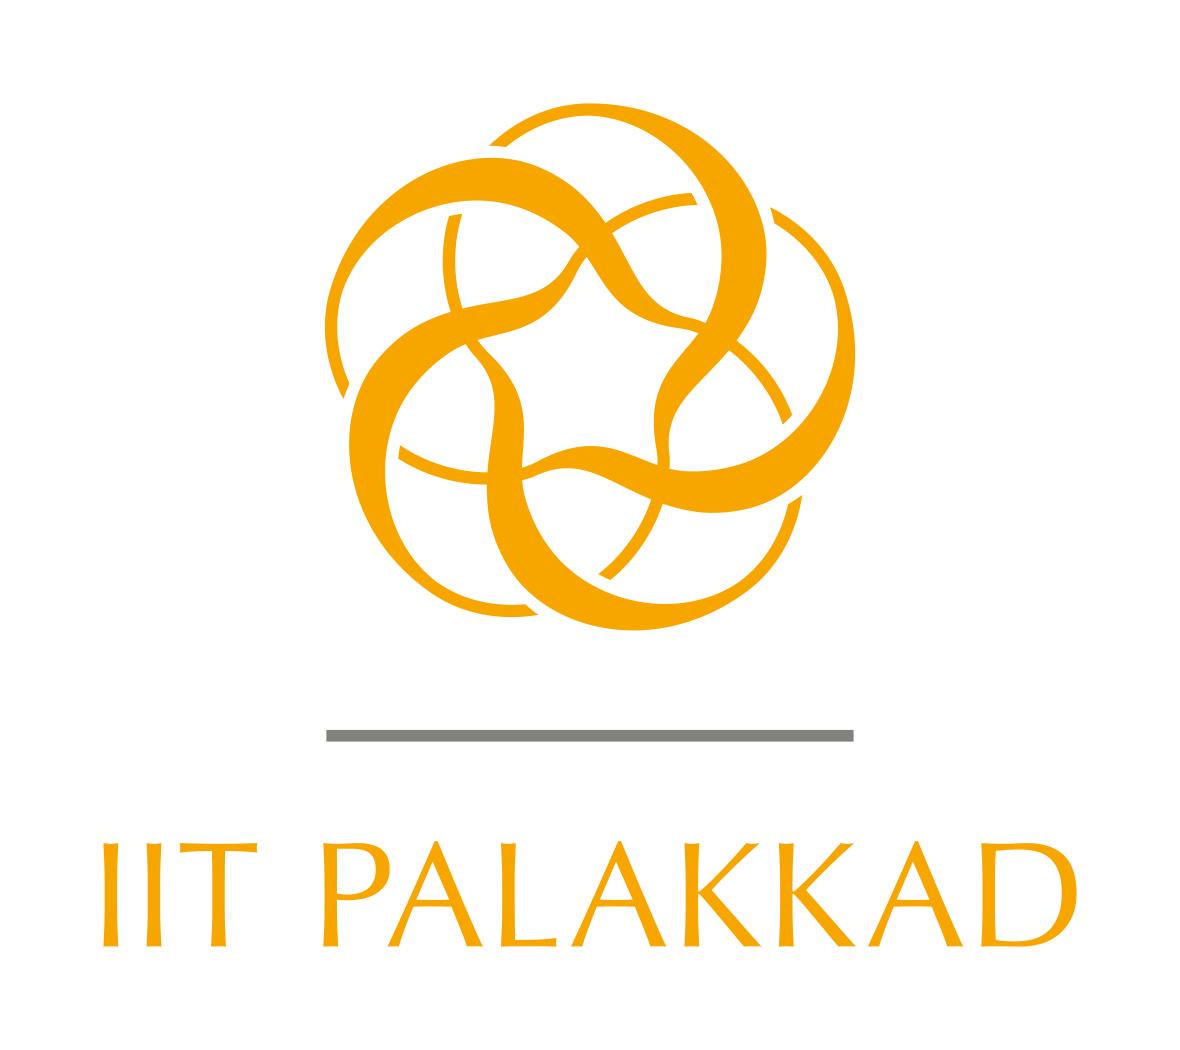 IIT Palakkad Admission 2021: M.Sc & M.Tech Program Eligibility & Application Form